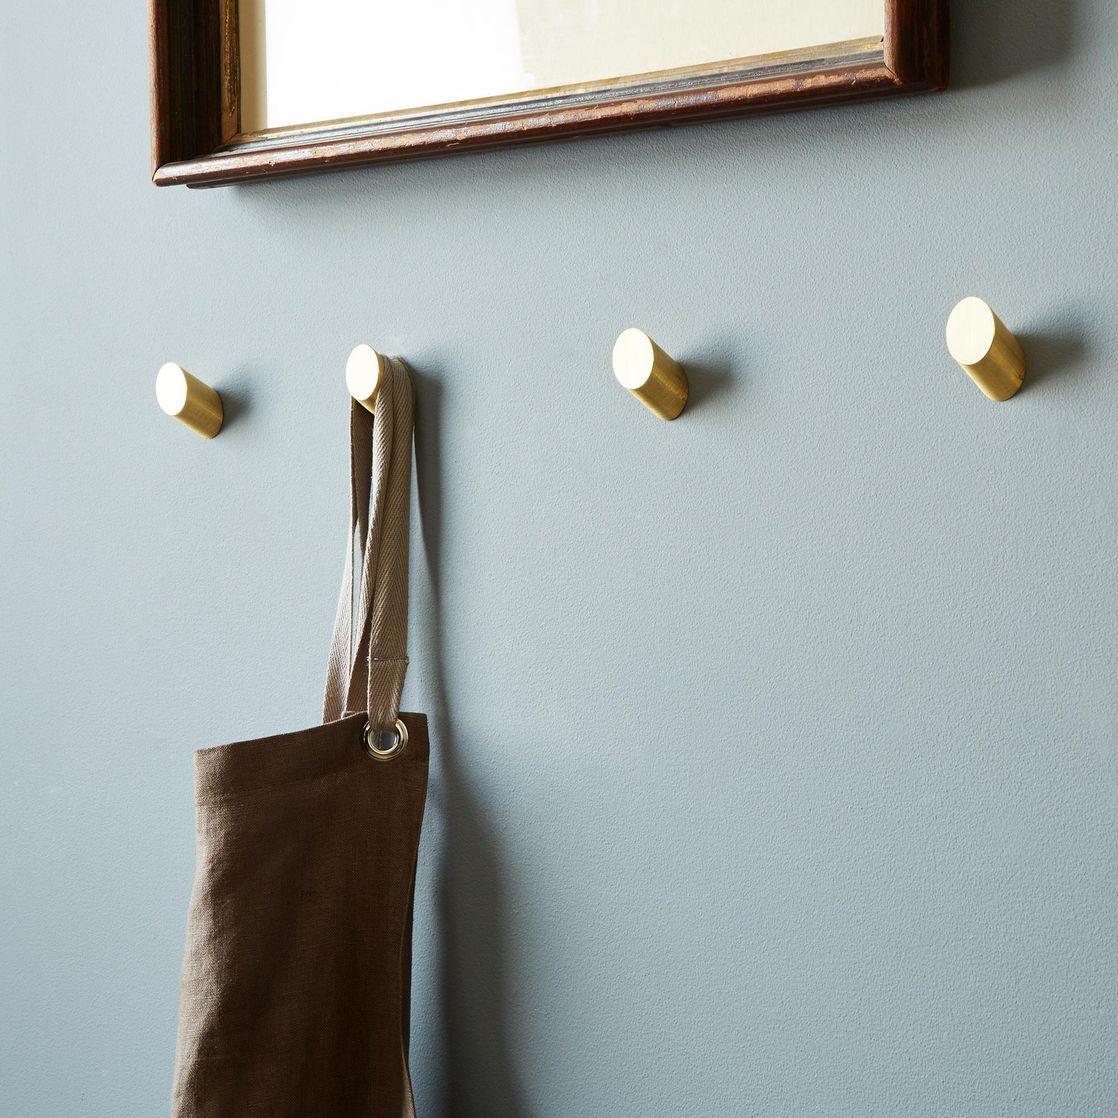 Brass Round Wall Hooks, Set of (4) via  Food52  ($180)